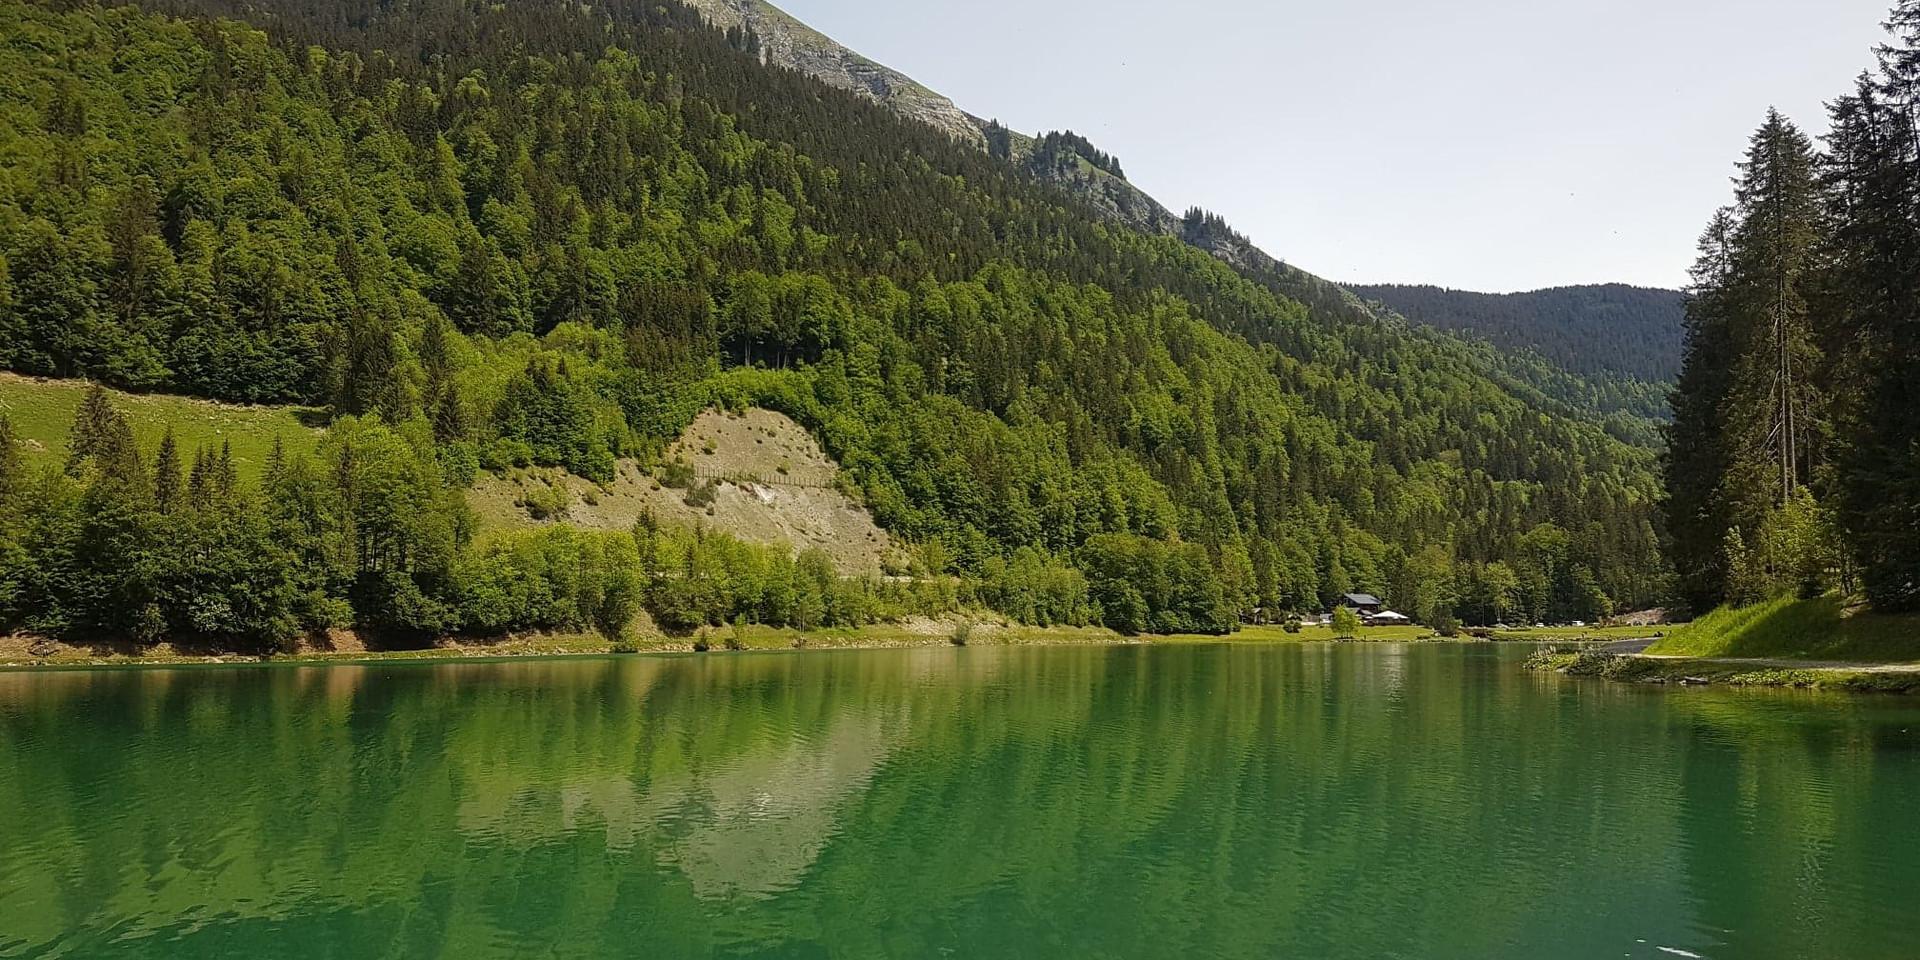 Lake Montriond